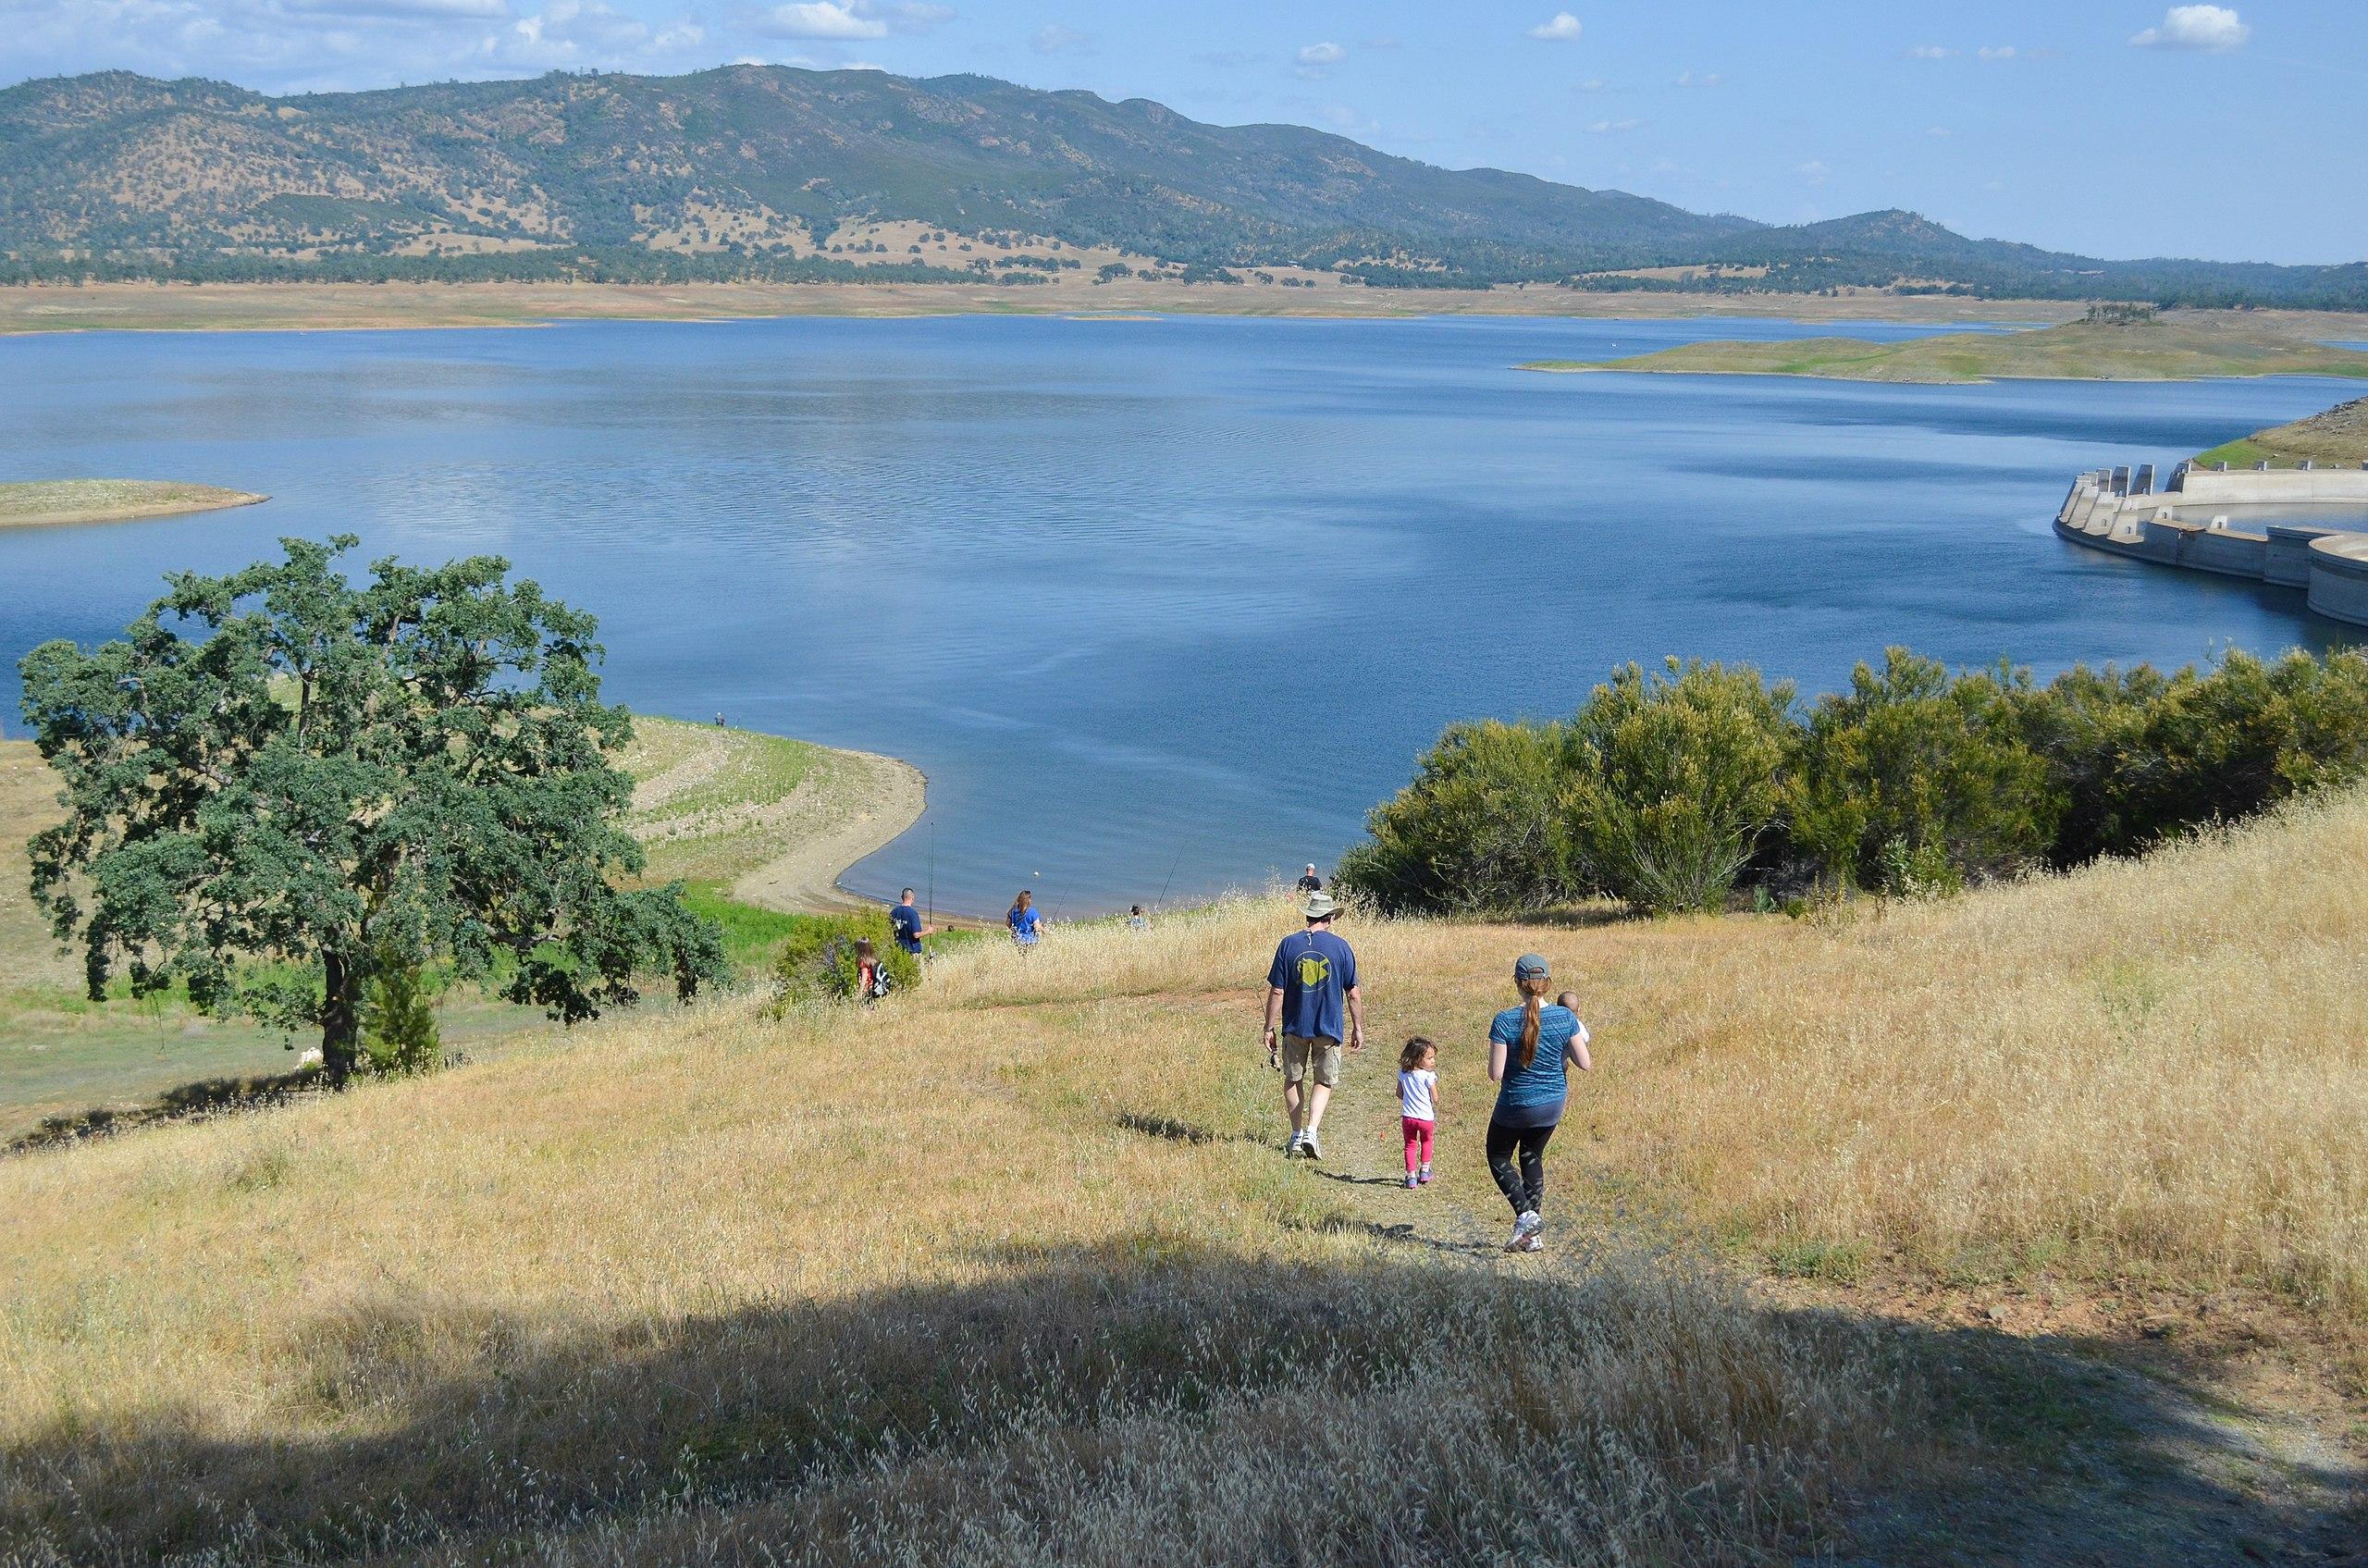 File:Hiking down to fish New Hogan Lake) (17837696071).jpg ...